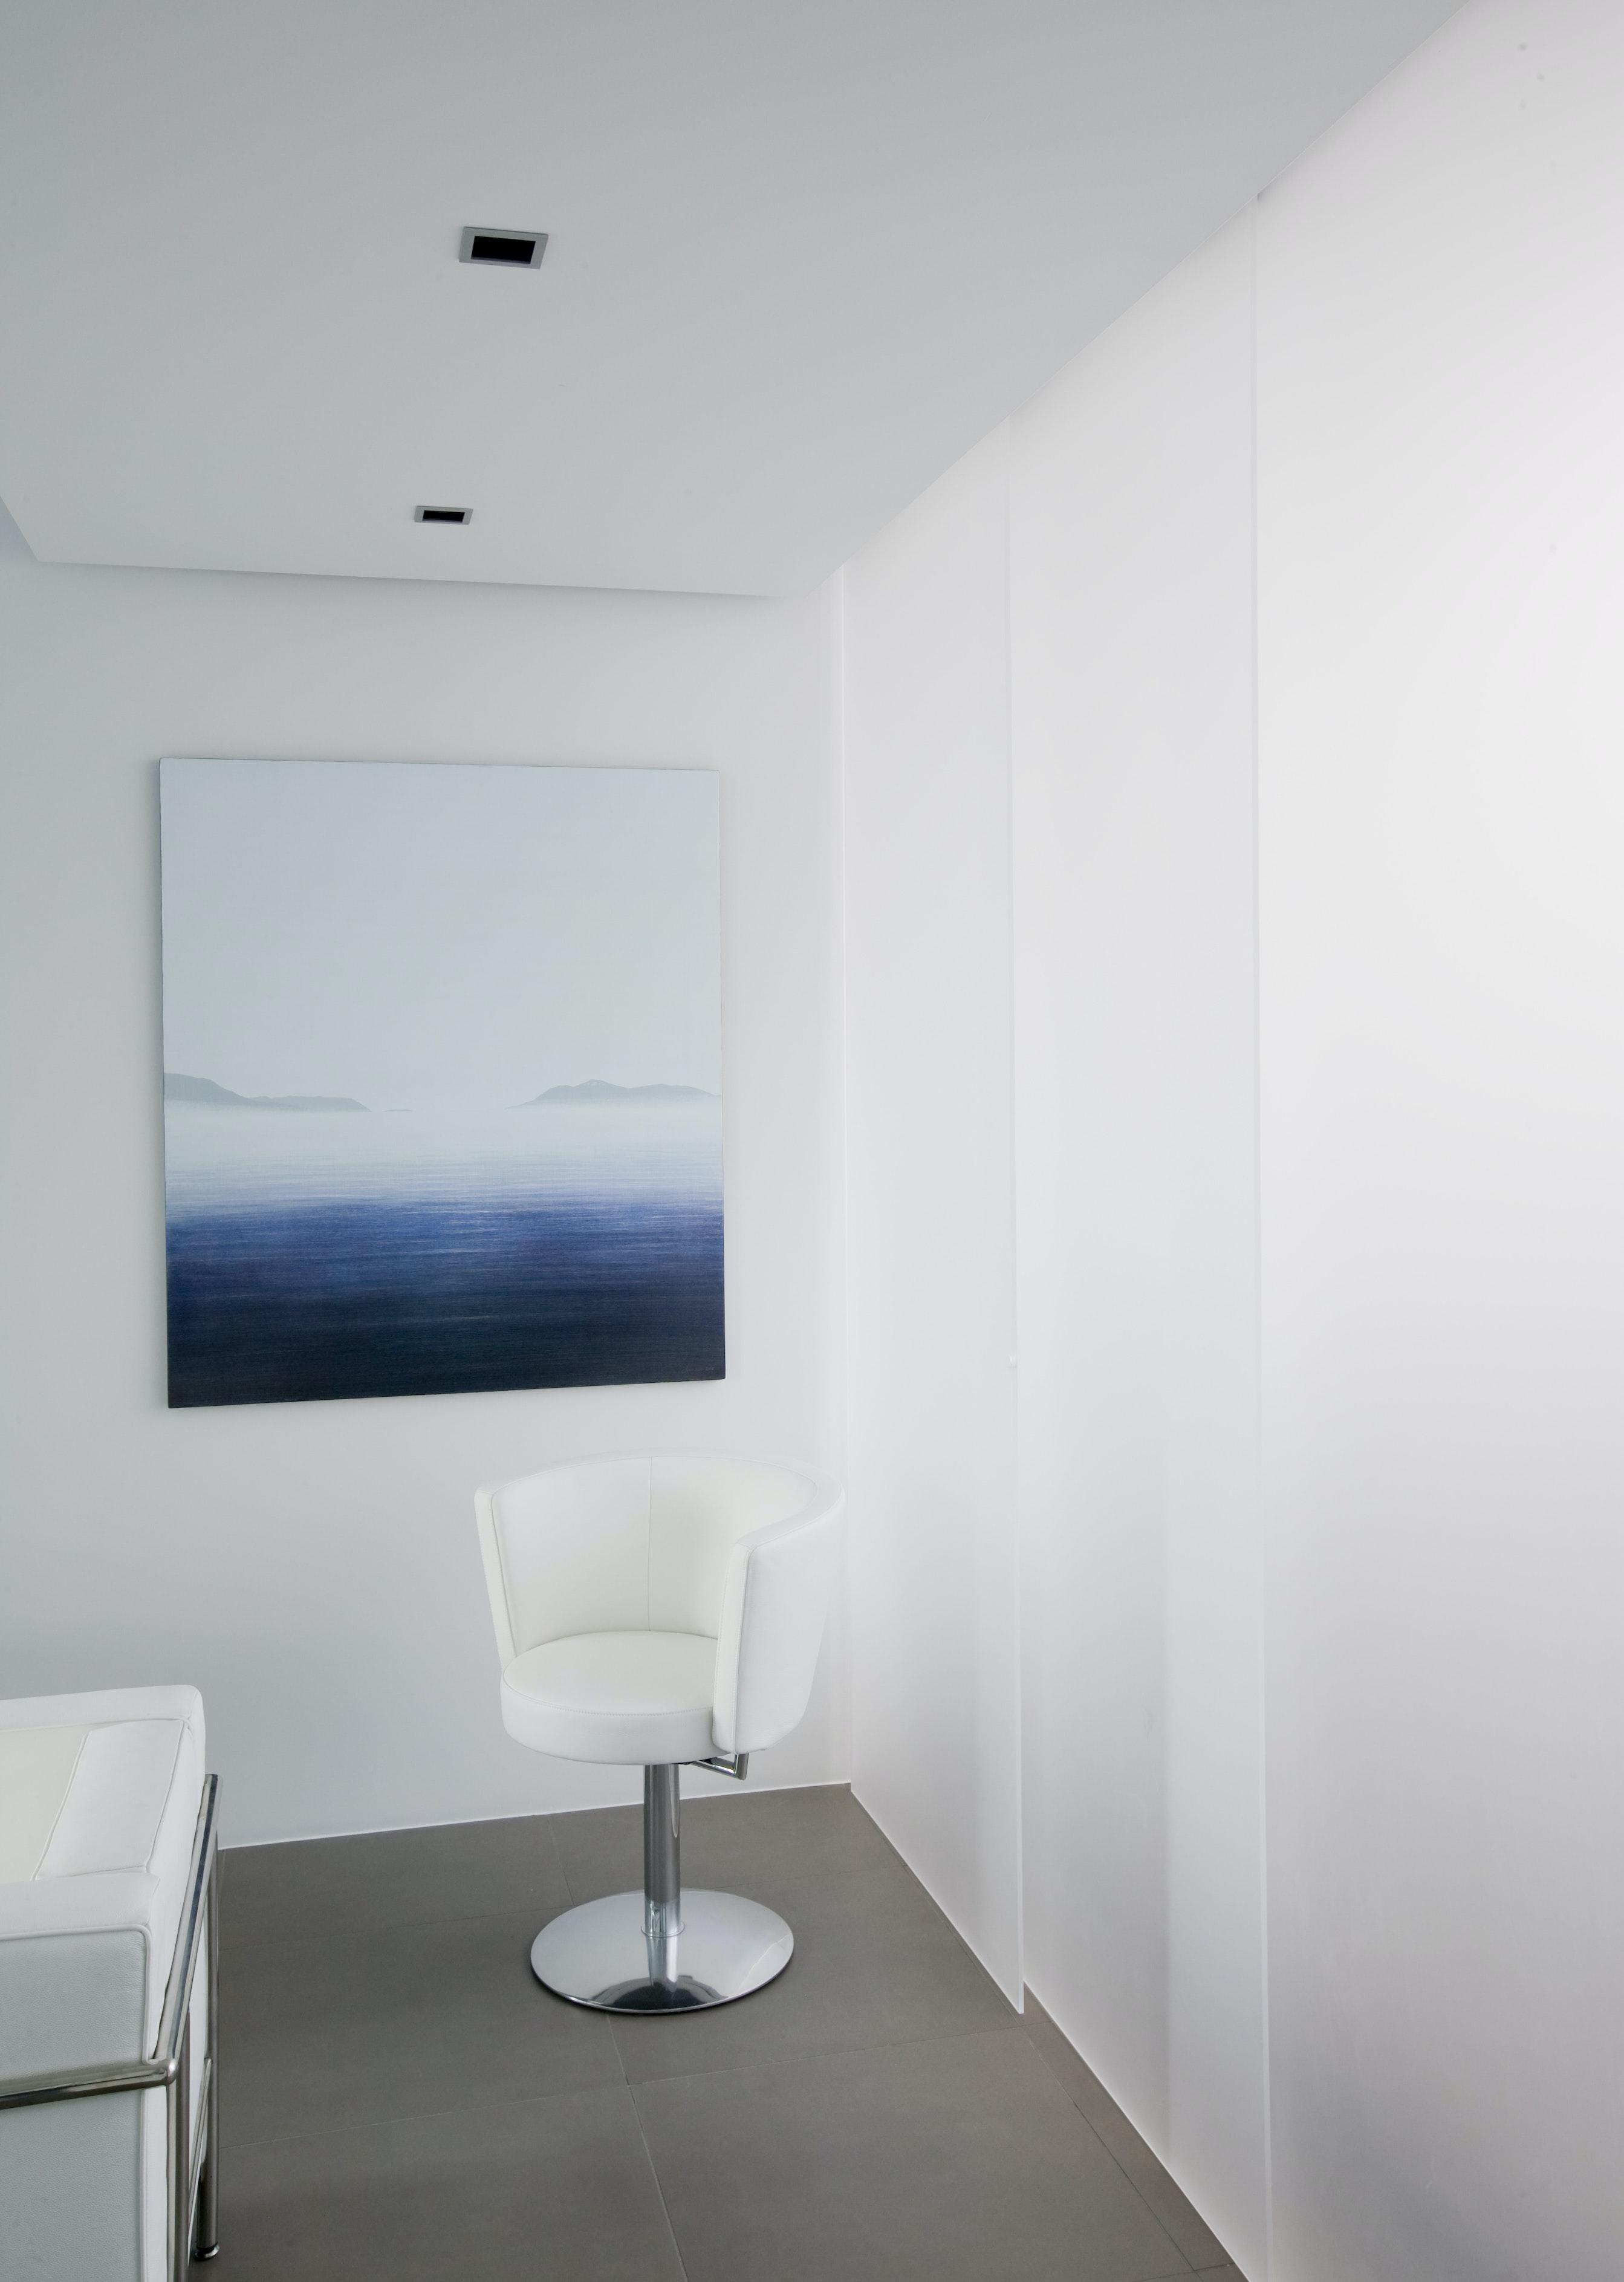 Exceptional Status: Built Location: Reykjavík, IS Design Ideas